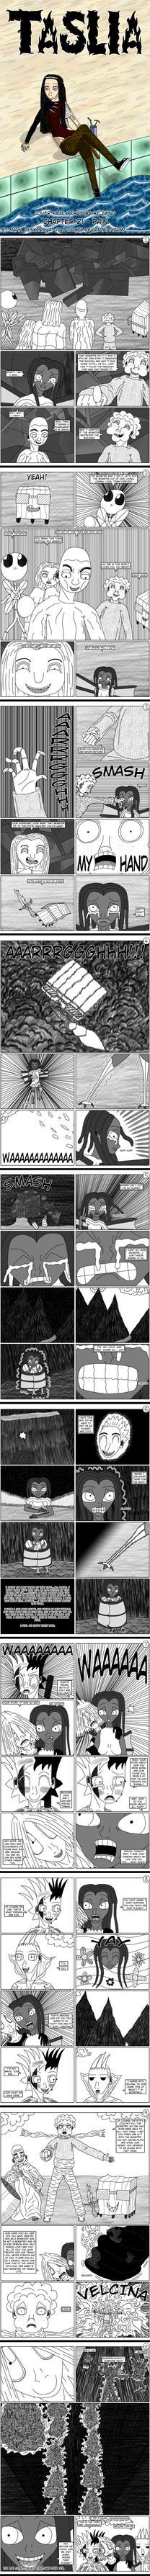 Taslia comic - Chapter 21, by ZXY8 by zxy8